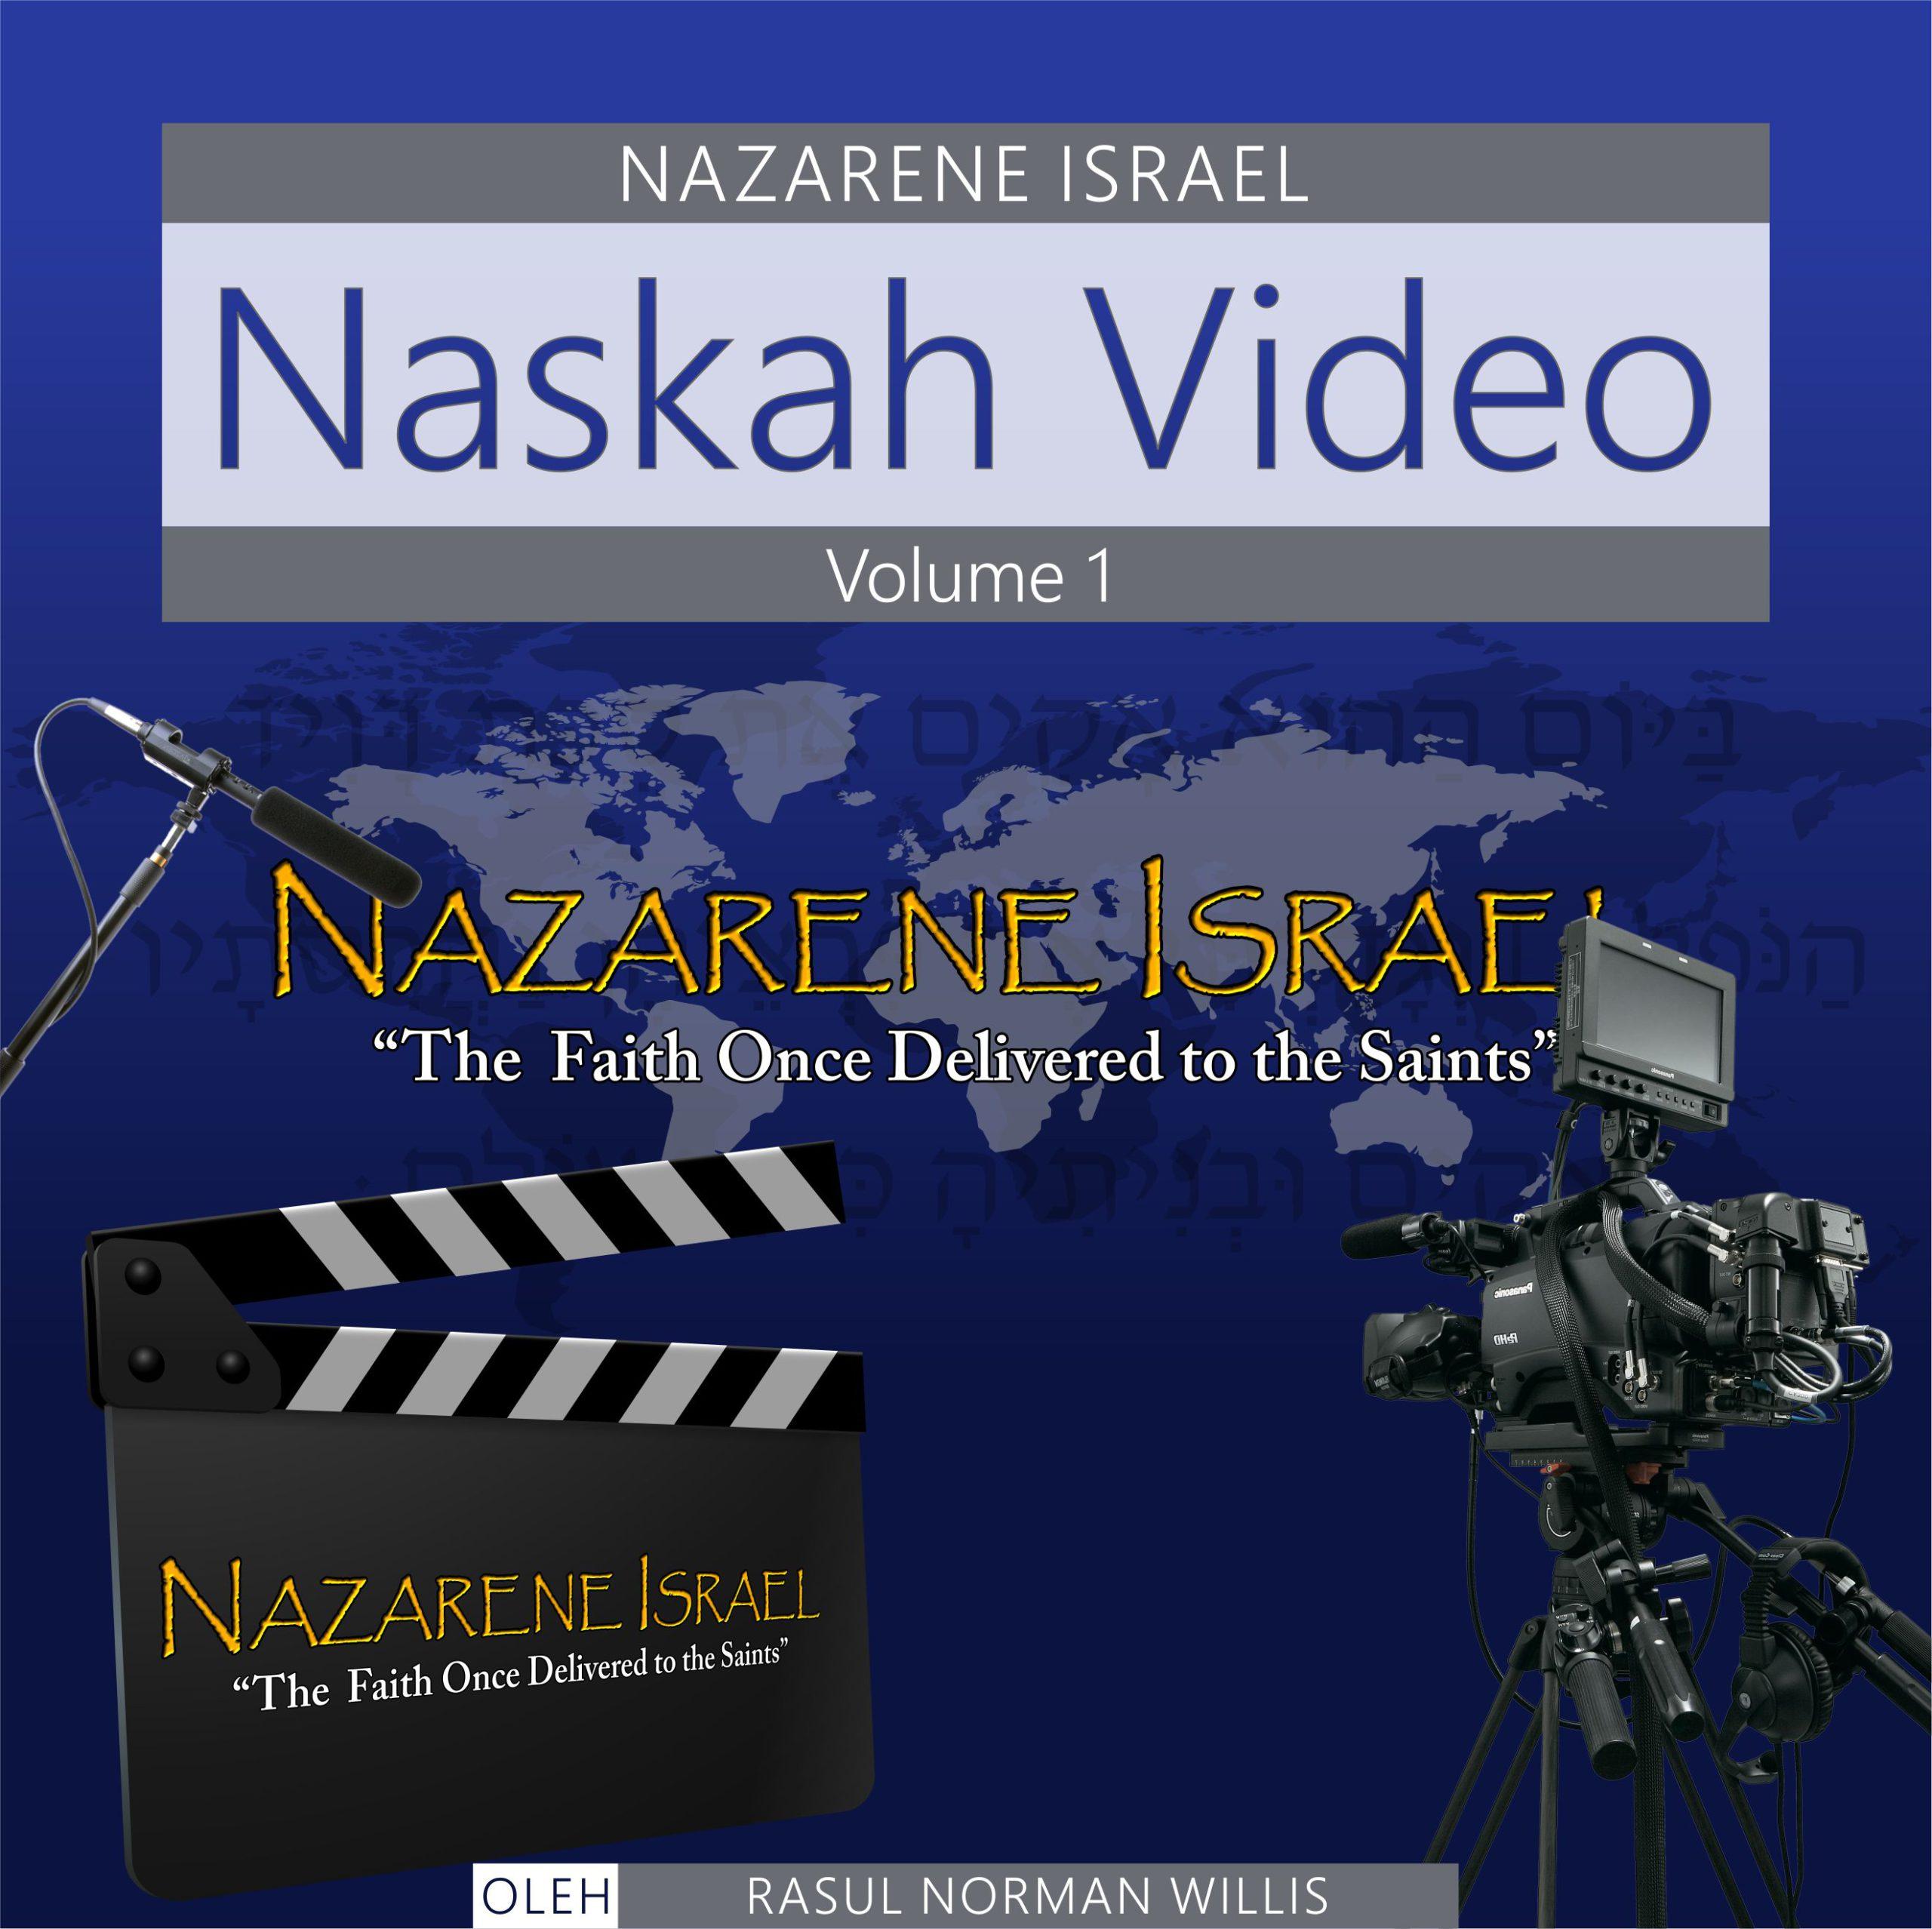 Naskah Video Nazarene Israel Volume 1